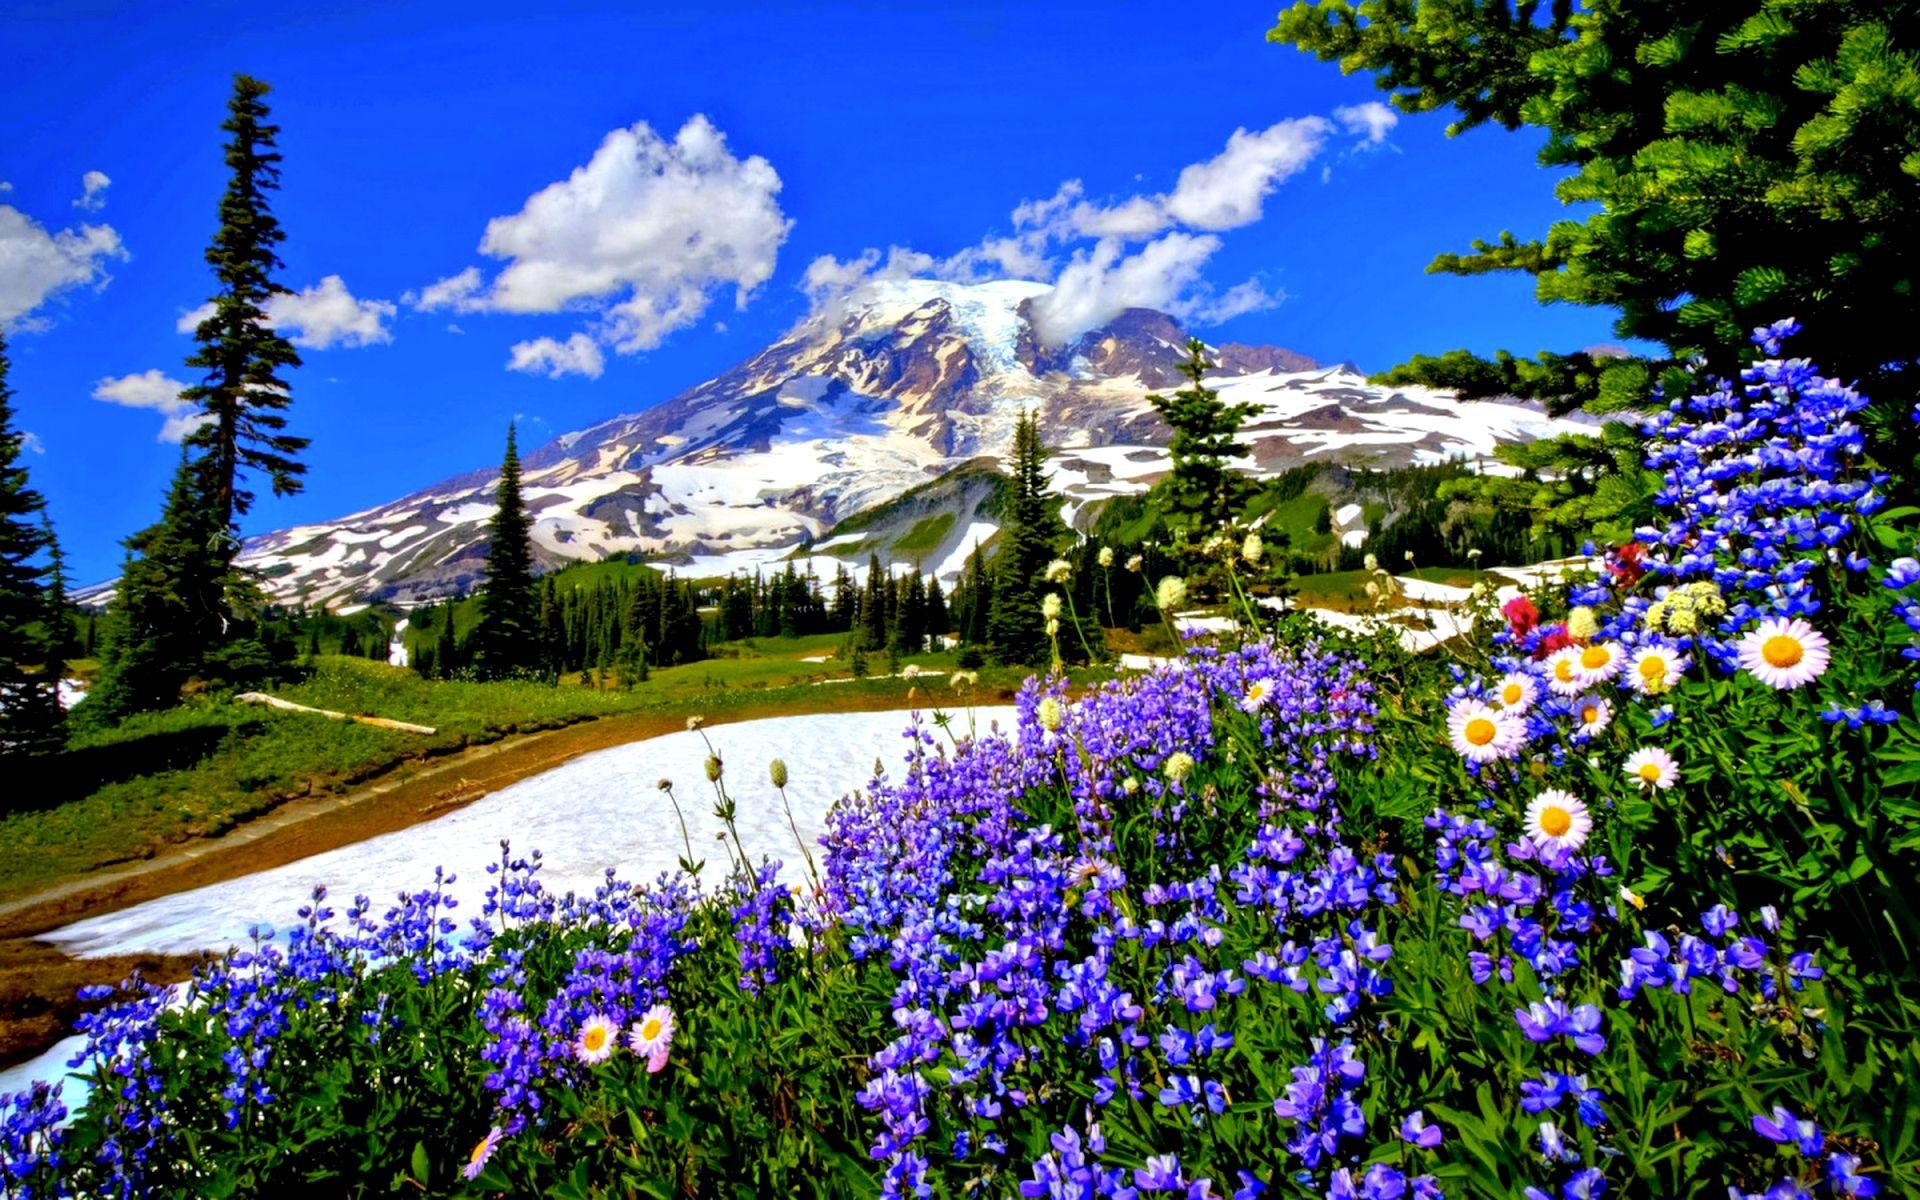 HD Spring Mountains Wallpaper